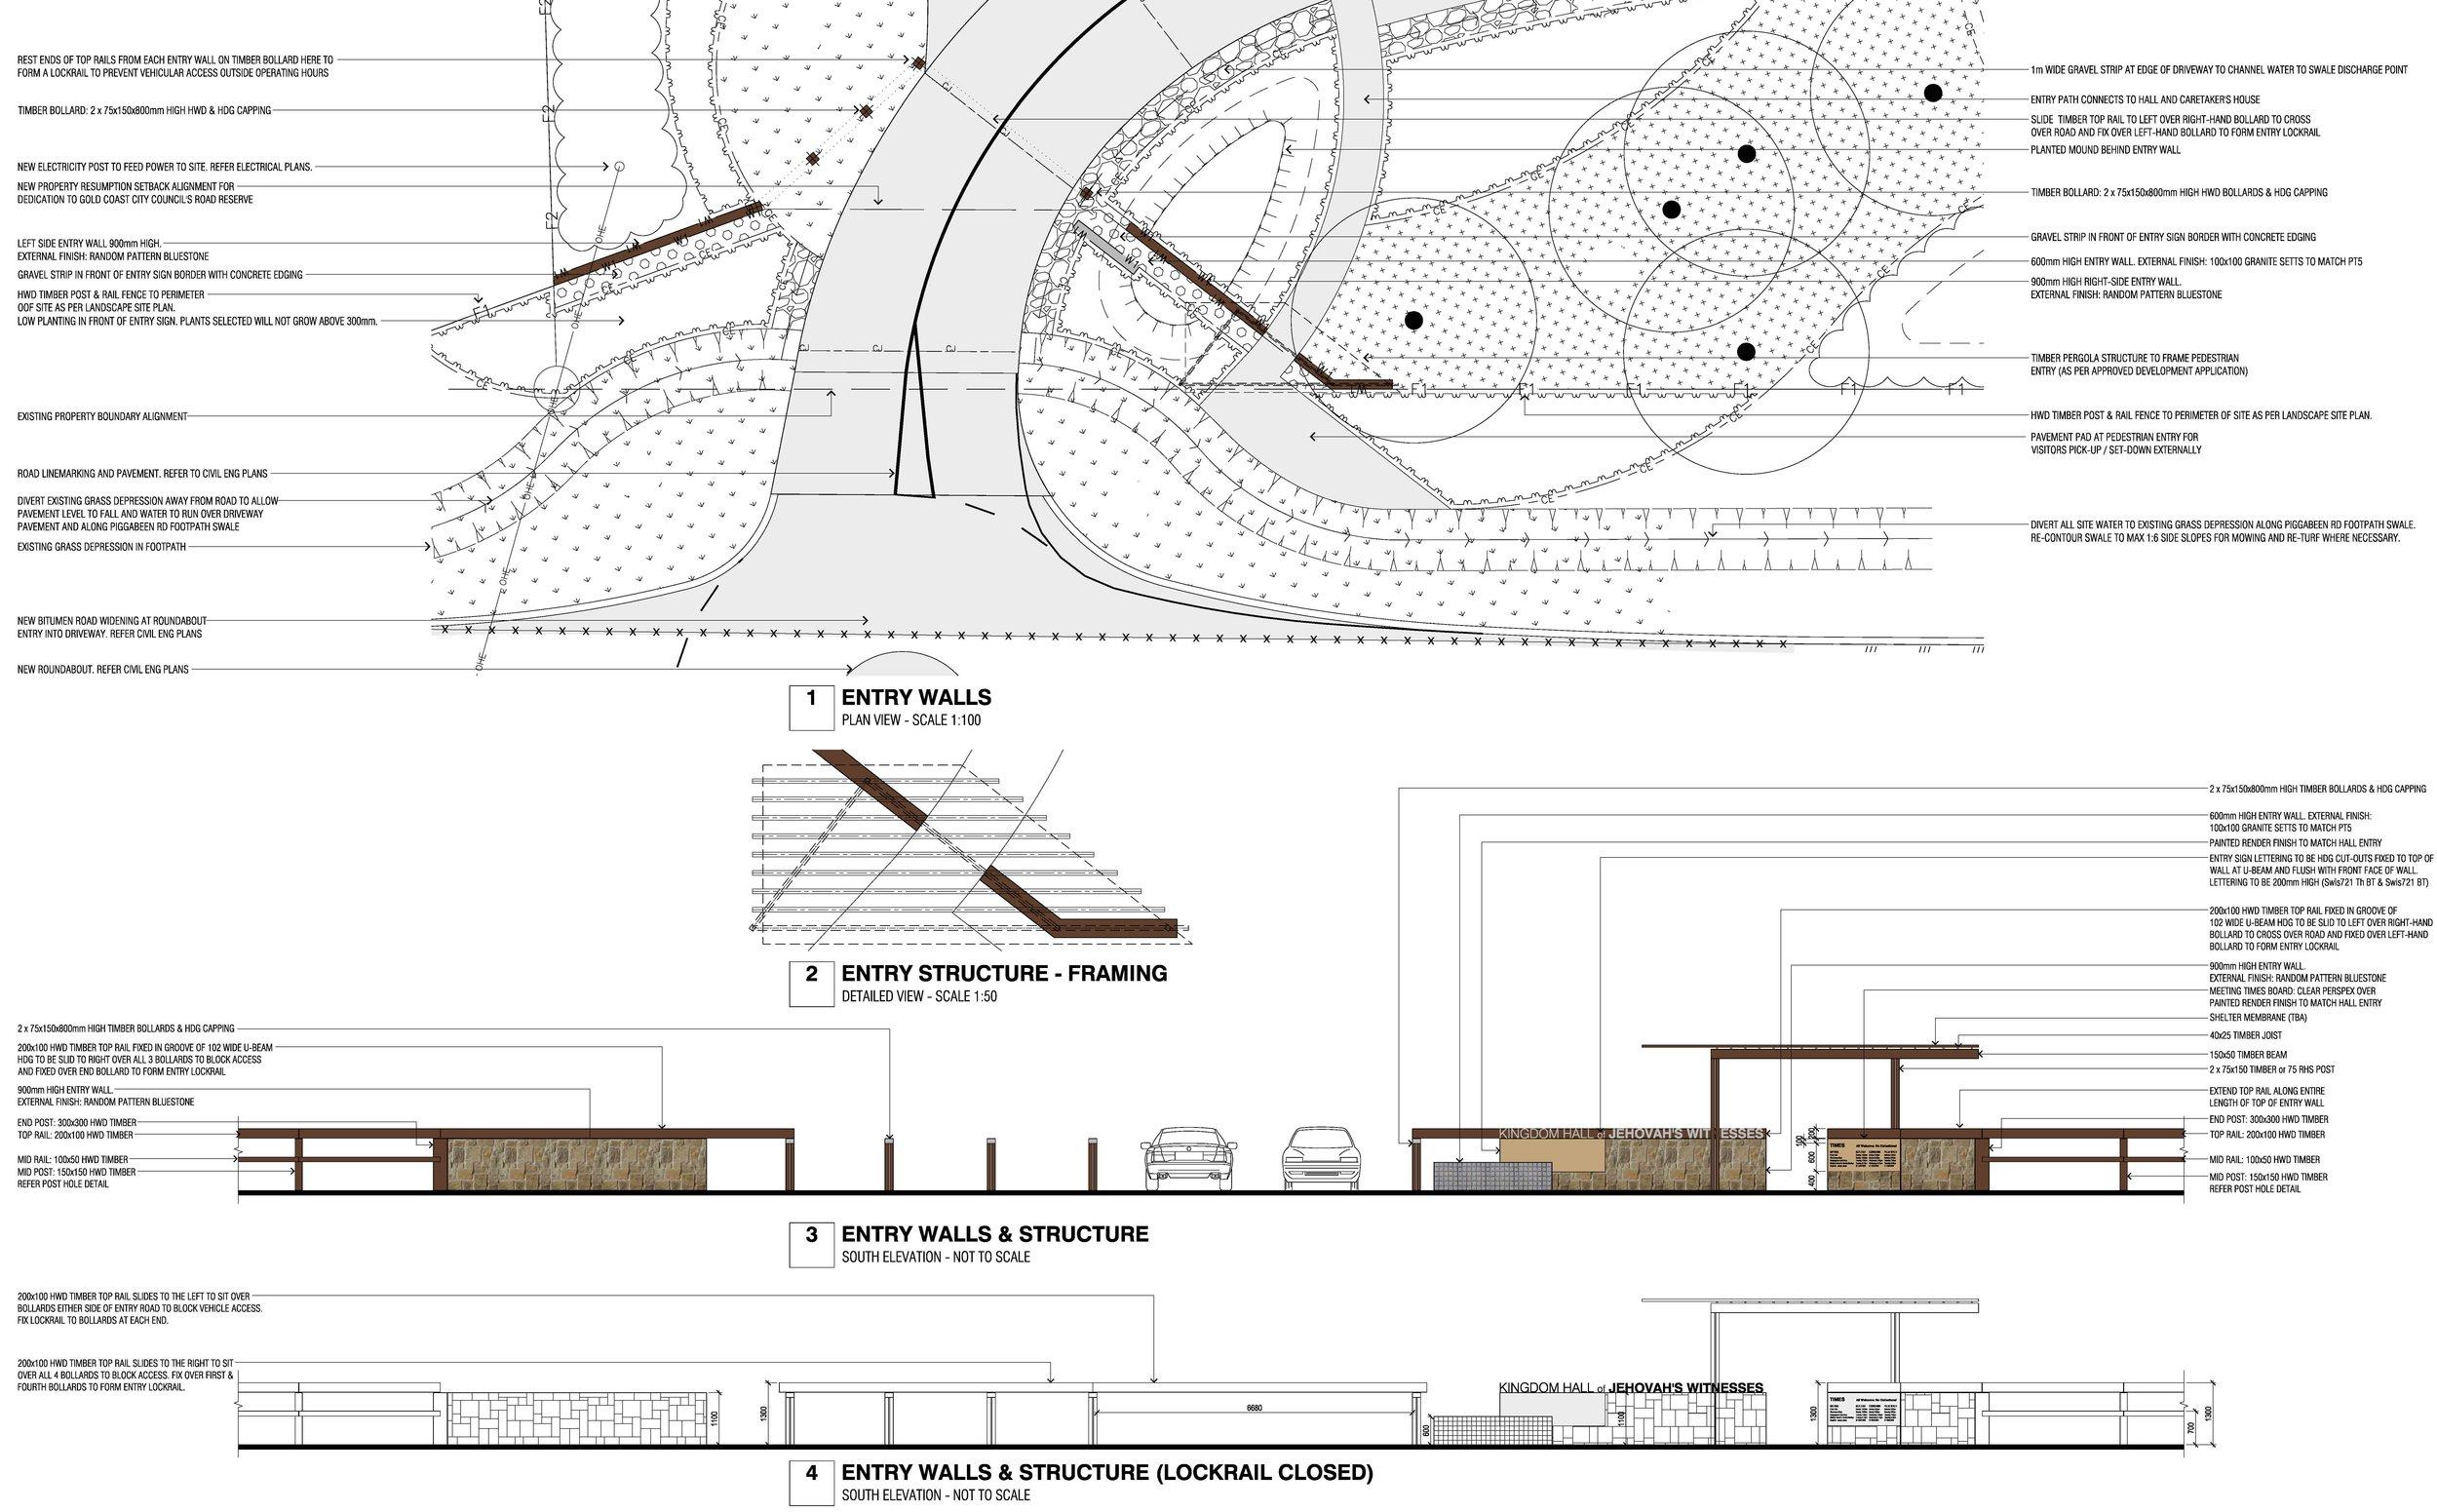 KH010-CV-L-011-Entry Wall & Structures Plan-Rev 01a.jpg